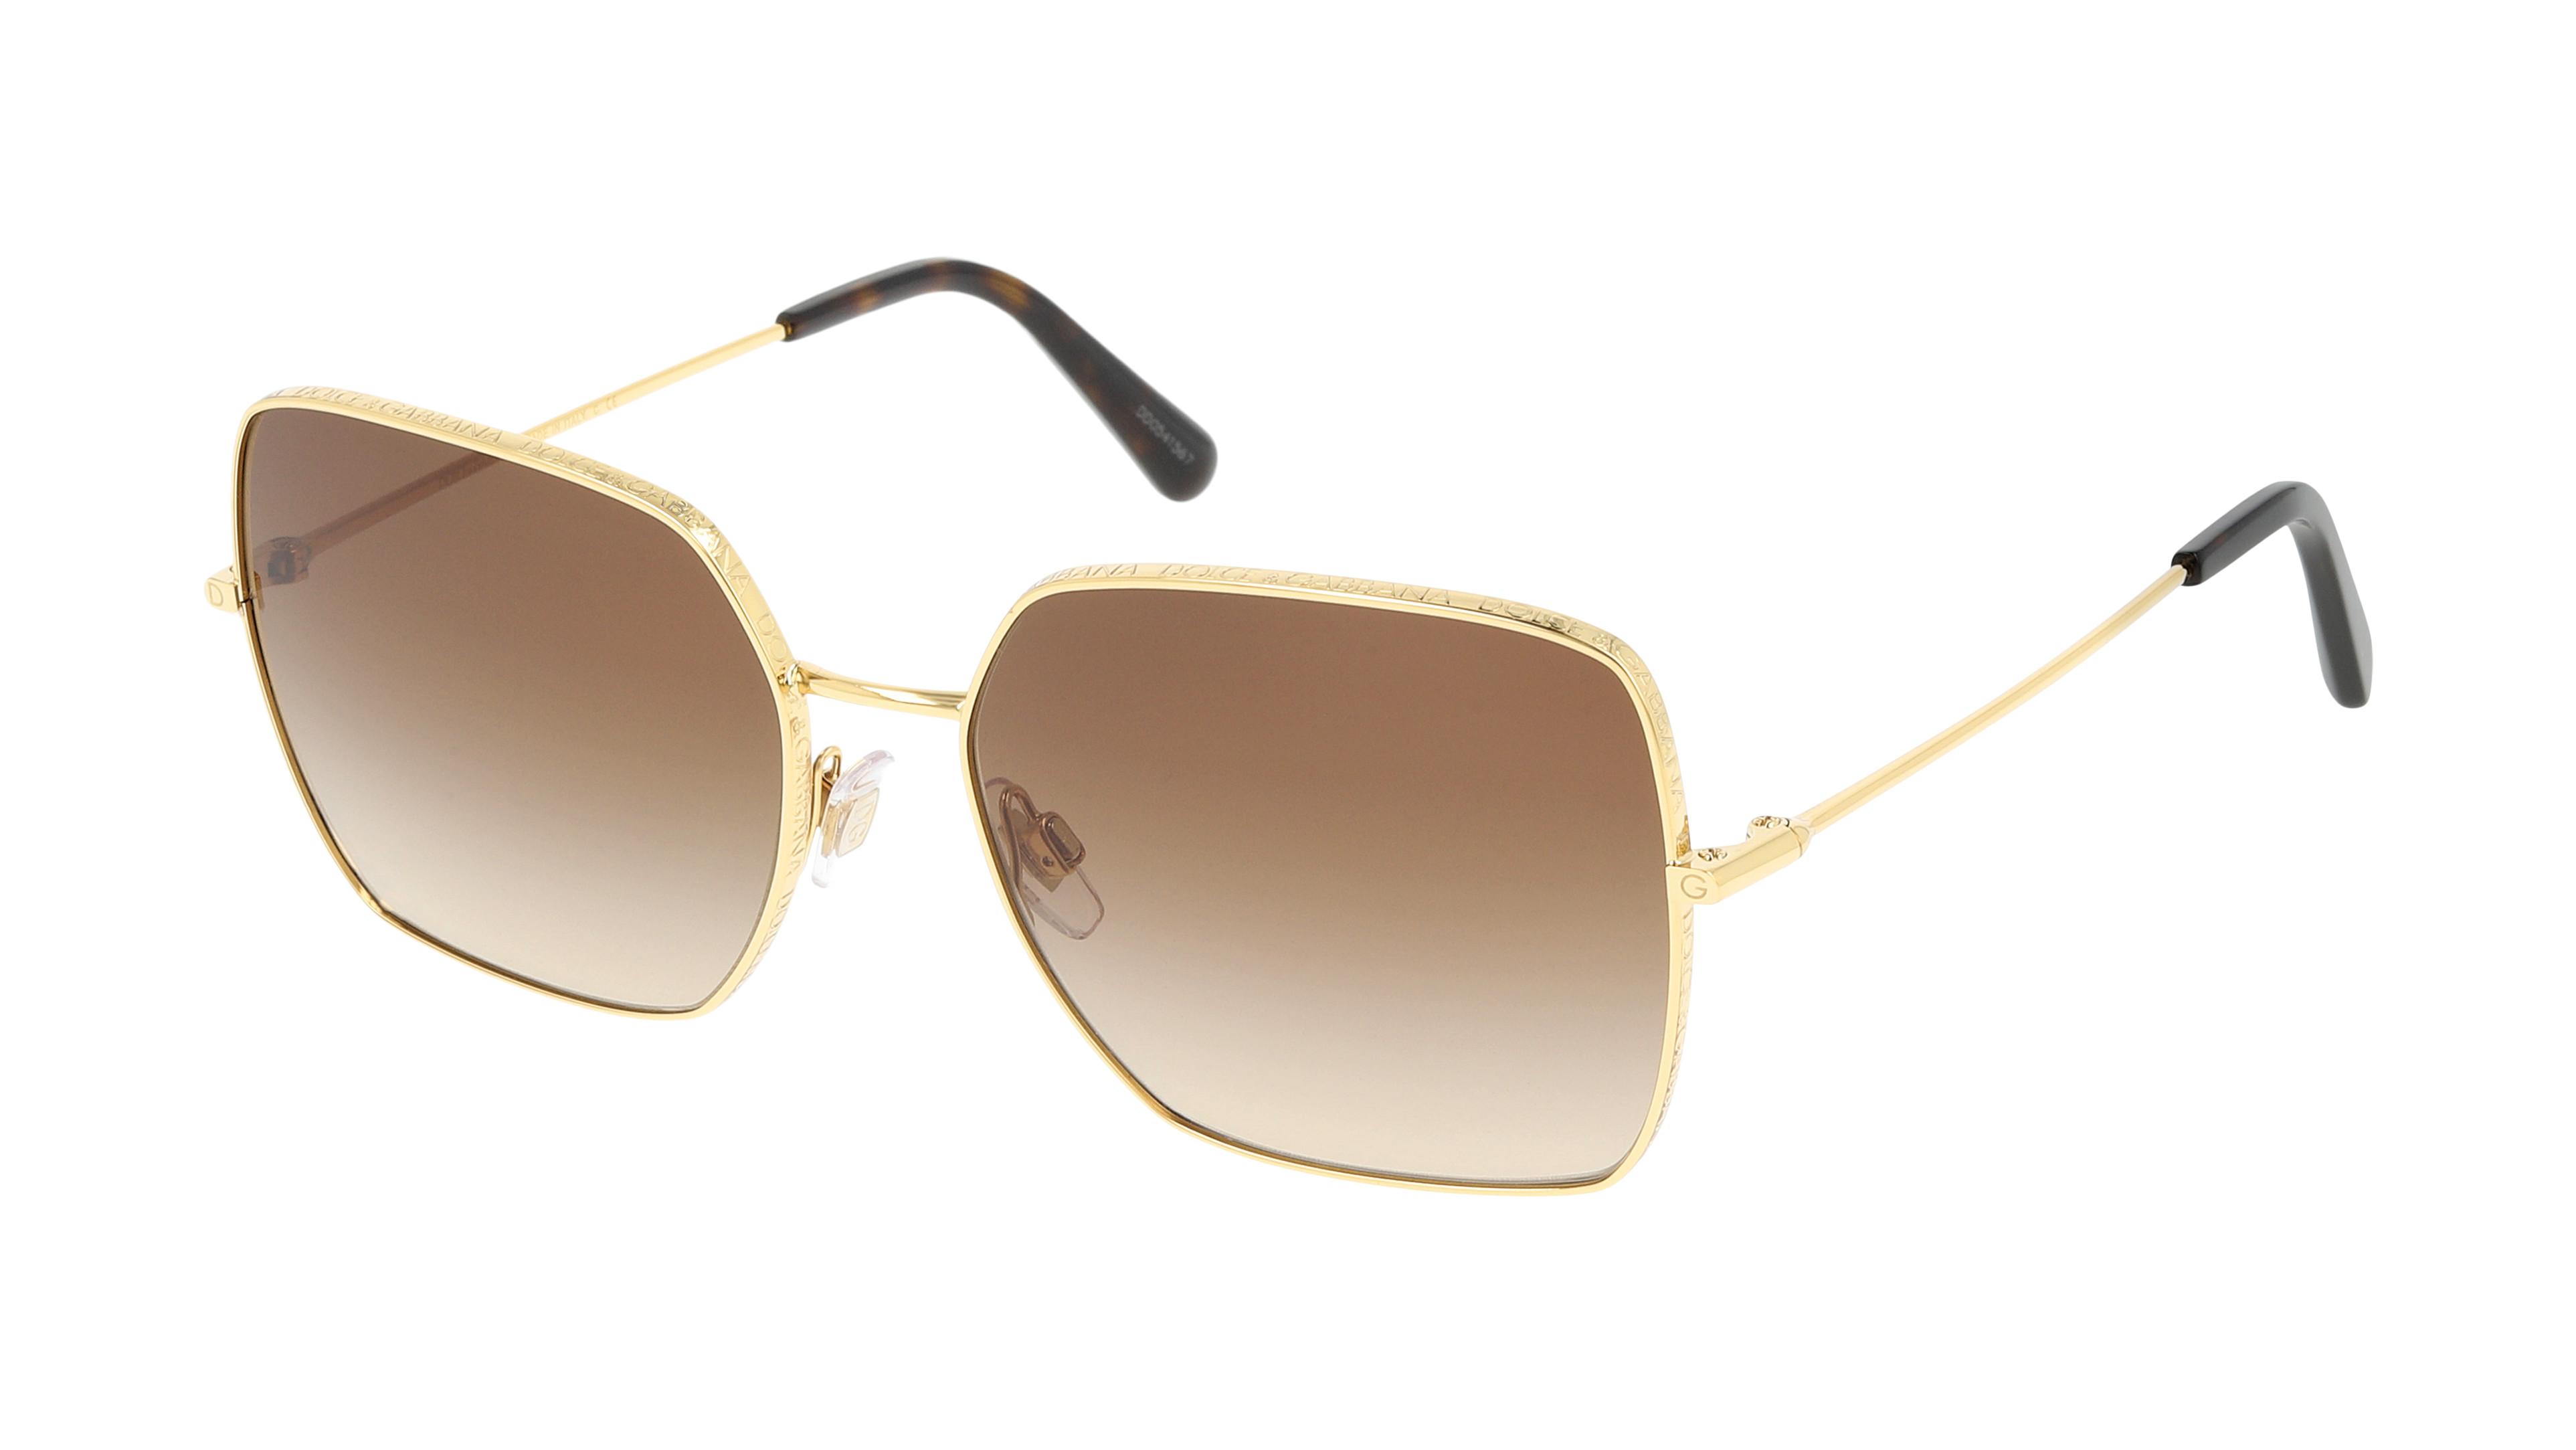 8056597133203-angle-dolce-and-gabbana-sonnenbrille-0dg2242-eyewear-gold_2